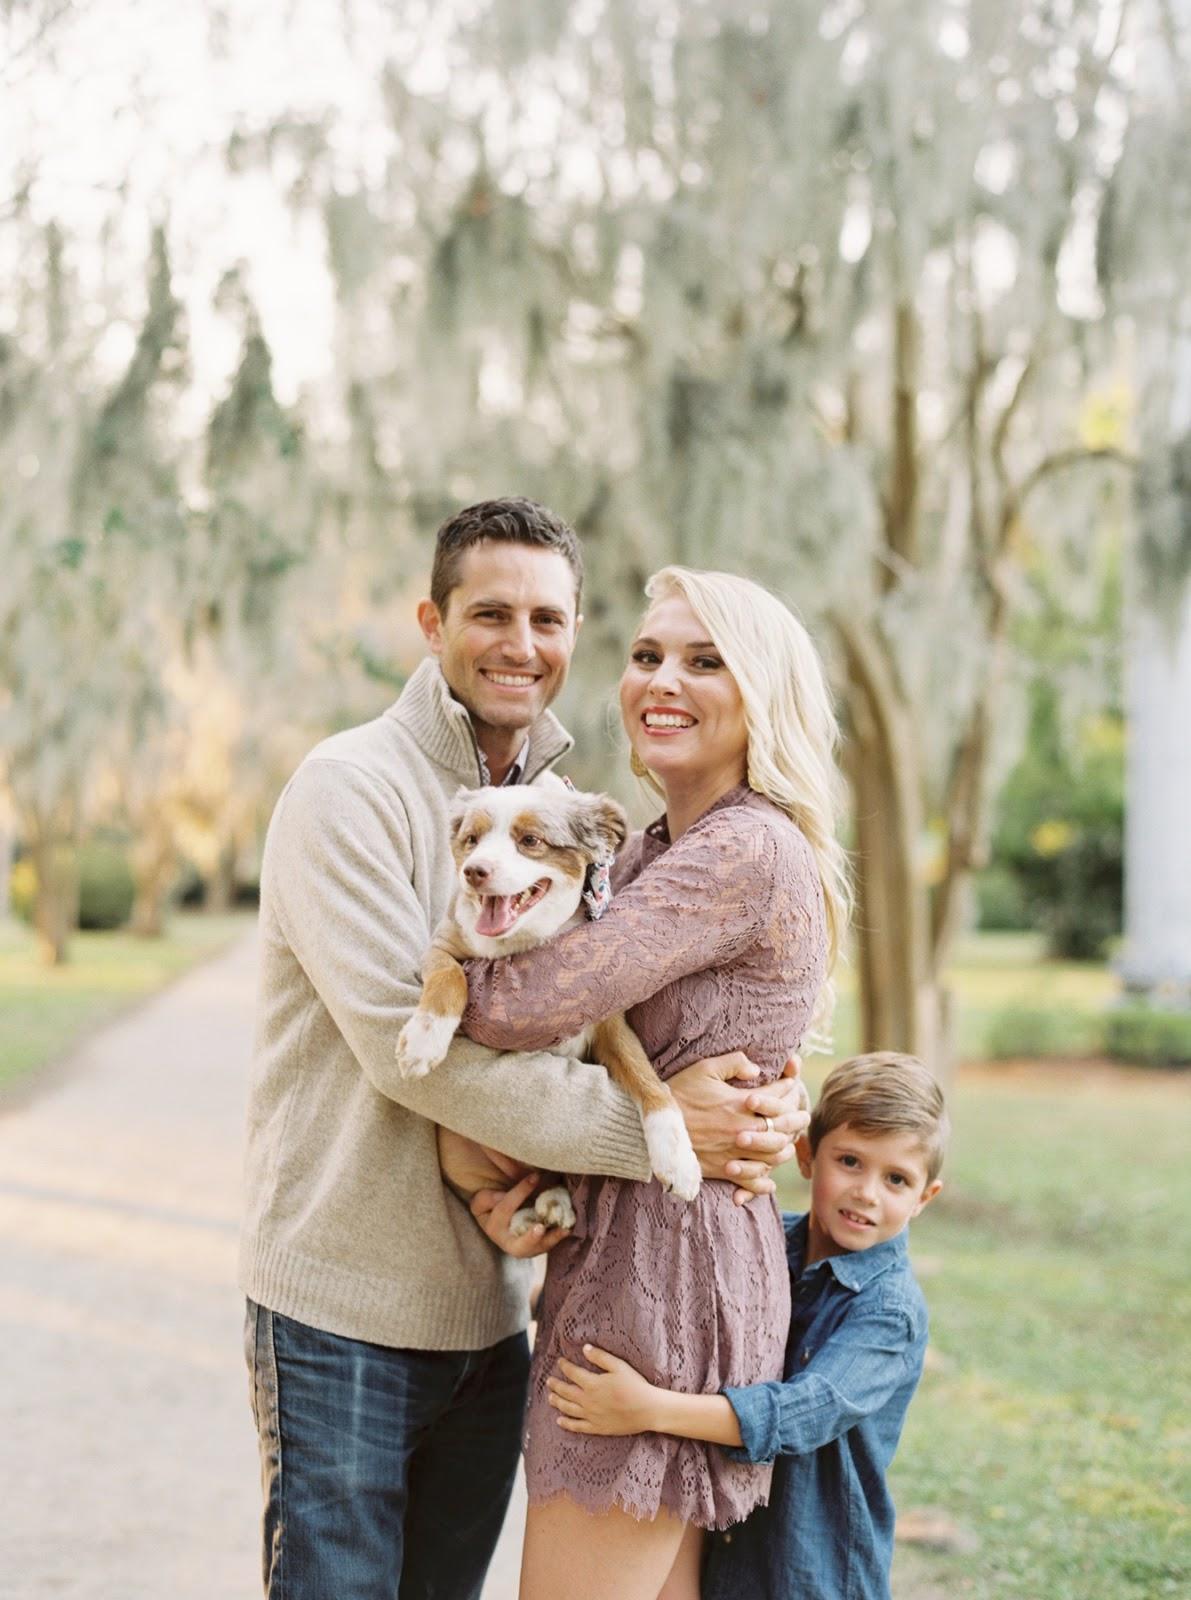 Charleston Blogger Charleston Blonde's Favorite Charleston Spots - Chasing Cinderella